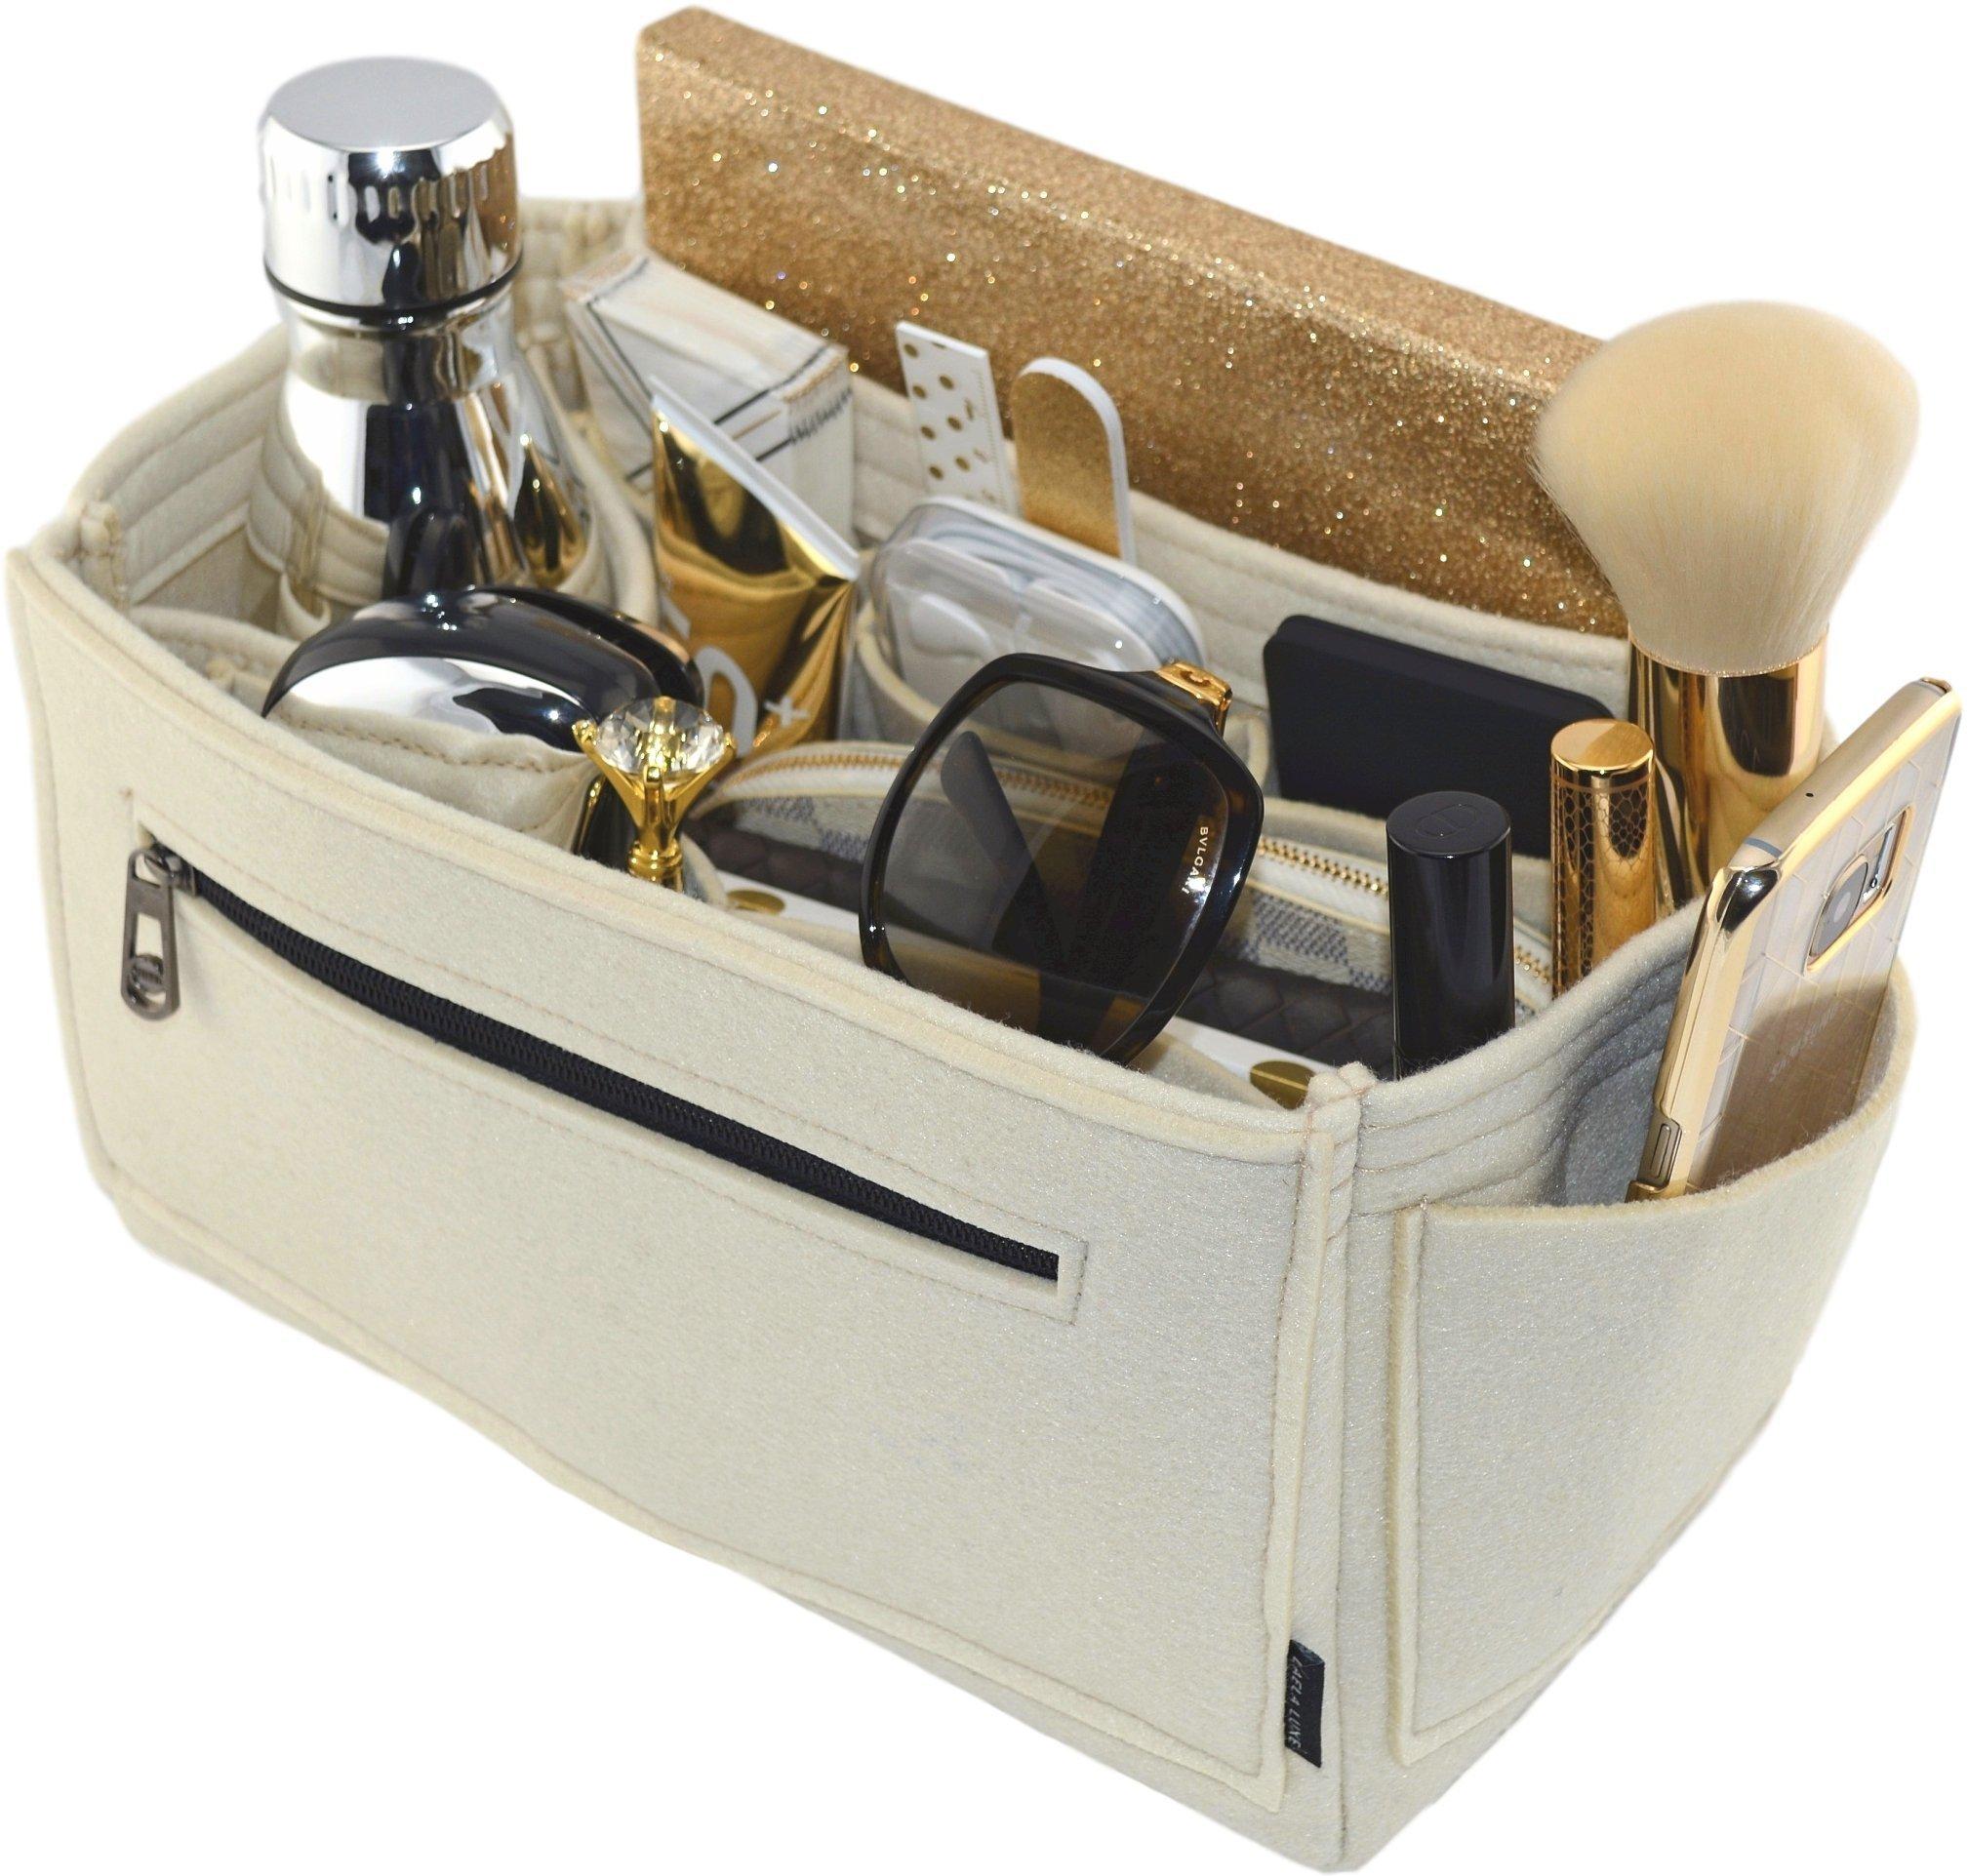 Laela Luxe Felt Handbag Purse Organizer, 14 Pockets, 2 Sizes - Tote & Handbag Shaper (Large, Cream)